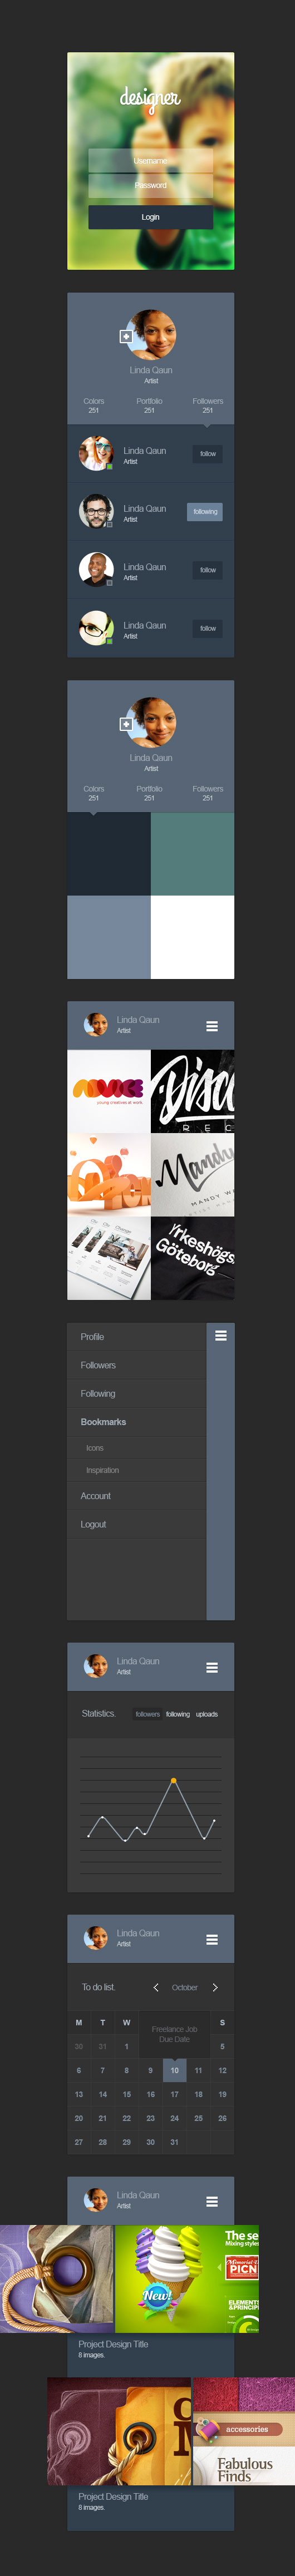 Designer-Portfolio-App-Ui-Kit-PSD